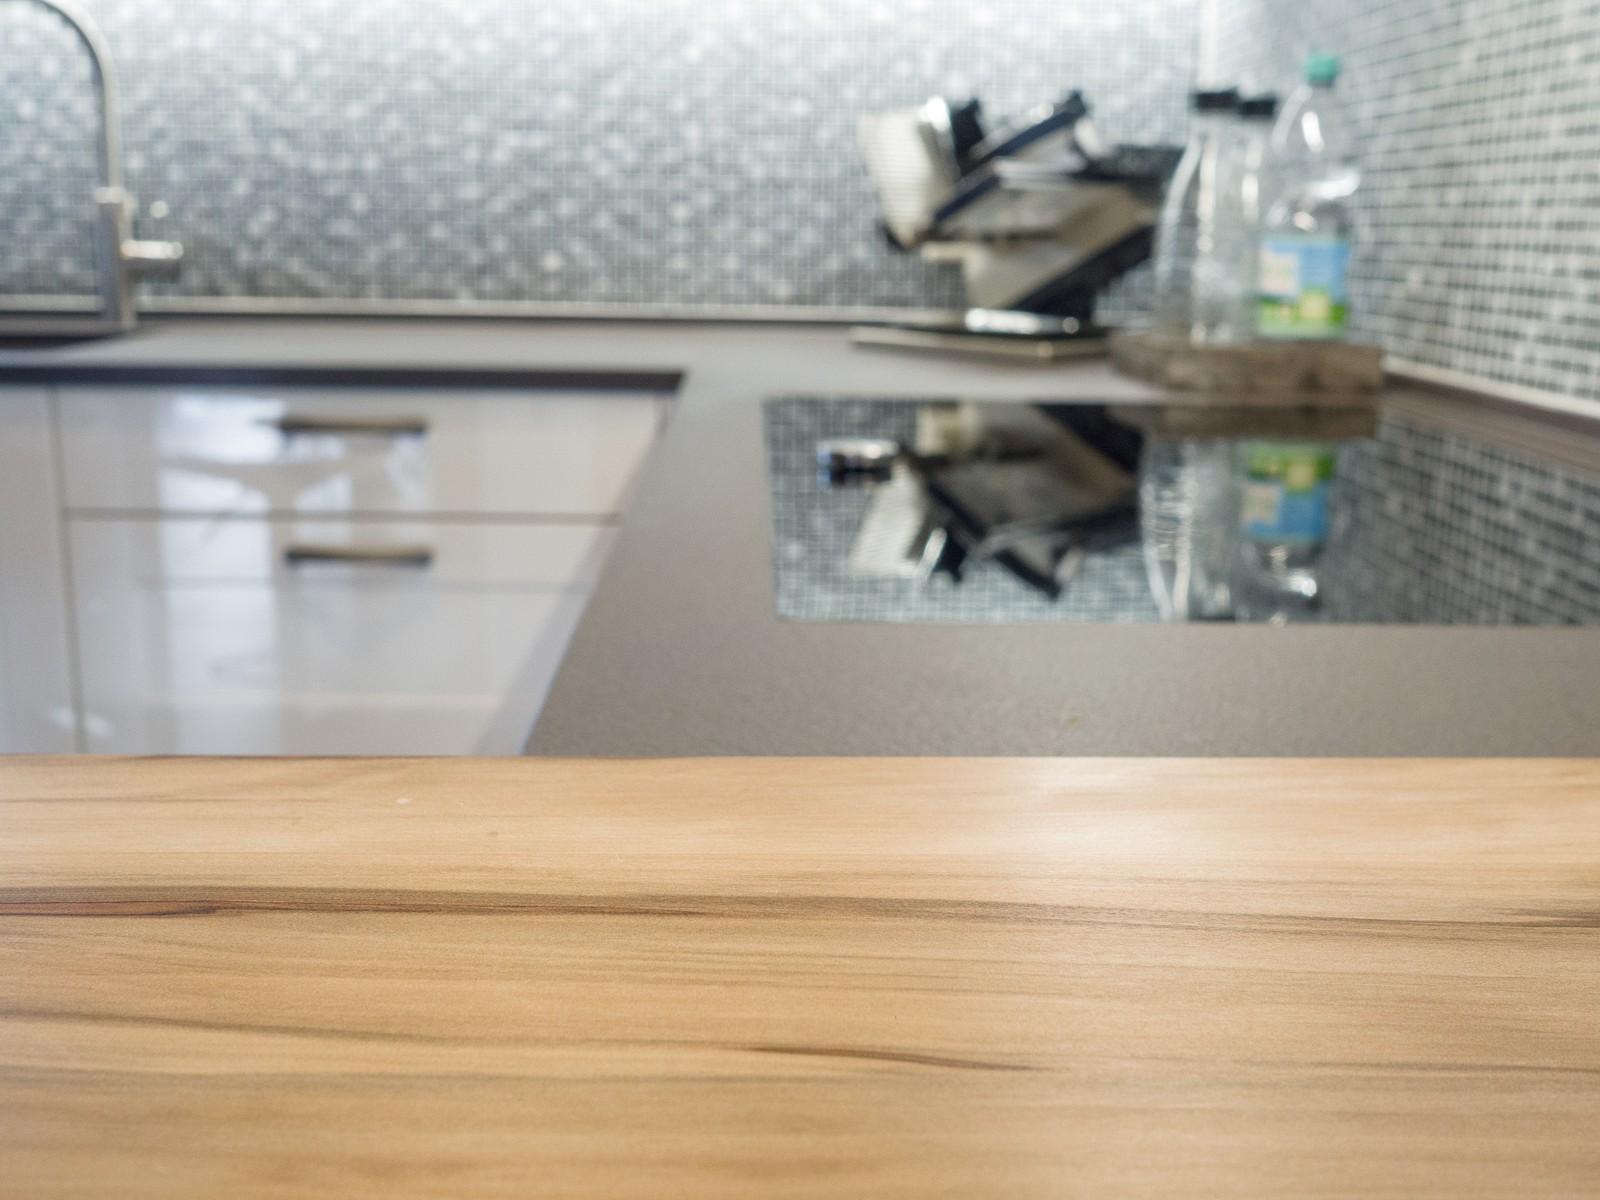 Haecker Systemat Kueche Hochglanz Weiss Mit Marmortex Arbeitsplatte Theke Regal Massiv Neff Kochfeld Berbel Haube Quooker Kochendwasserhahn 8